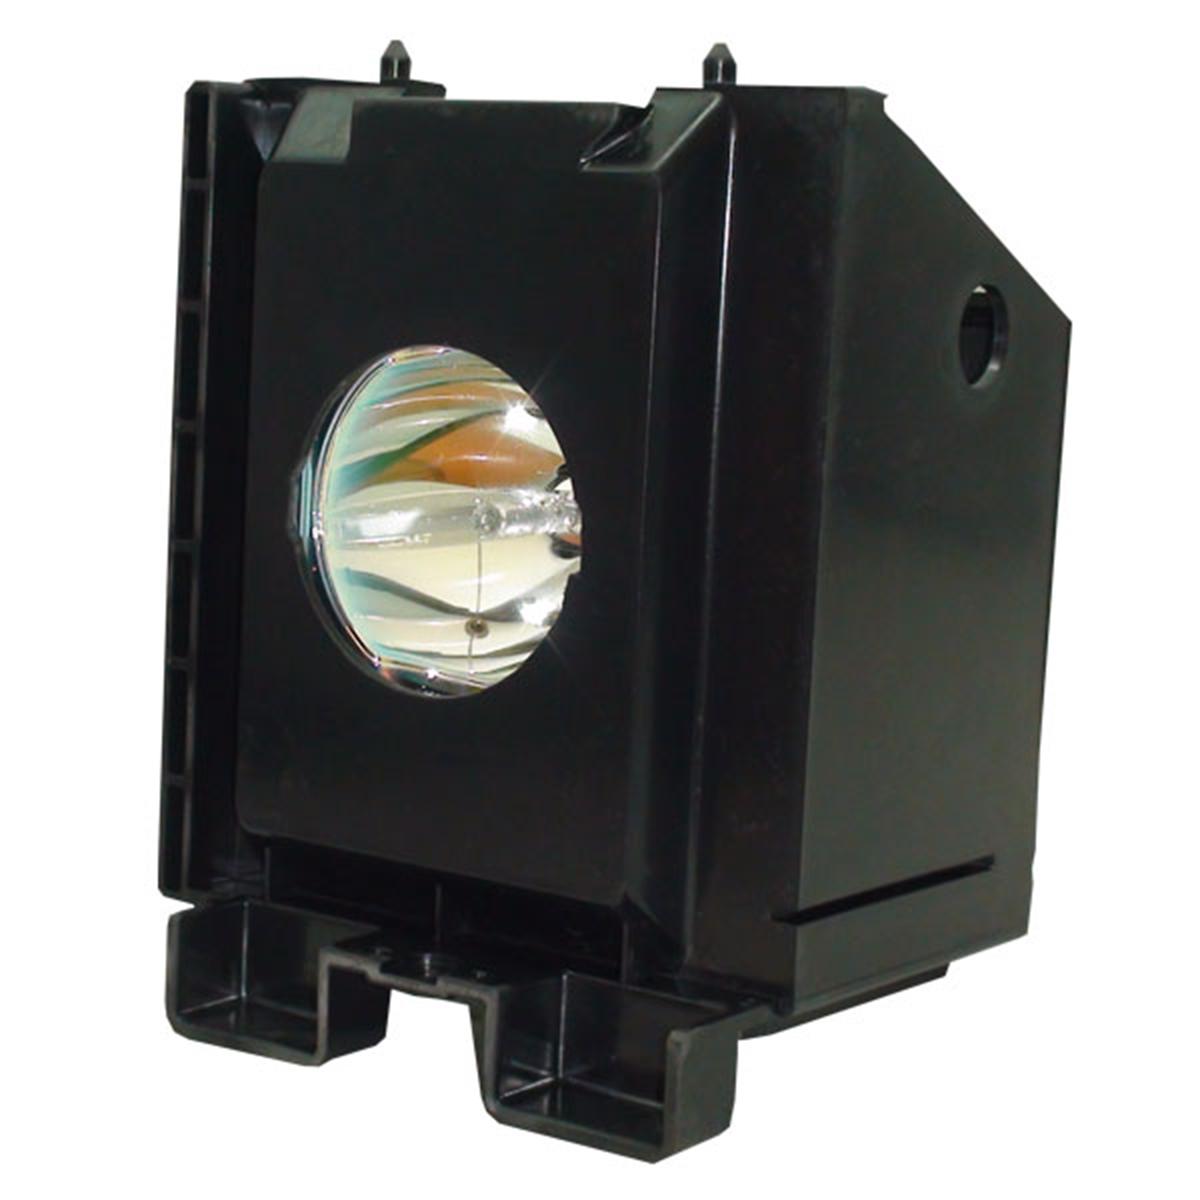 01073a replacement bulb cartridge for samsung hlr5667w tv lamp ebay. Black Bedroom Furniture Sets. Home Design Ideas